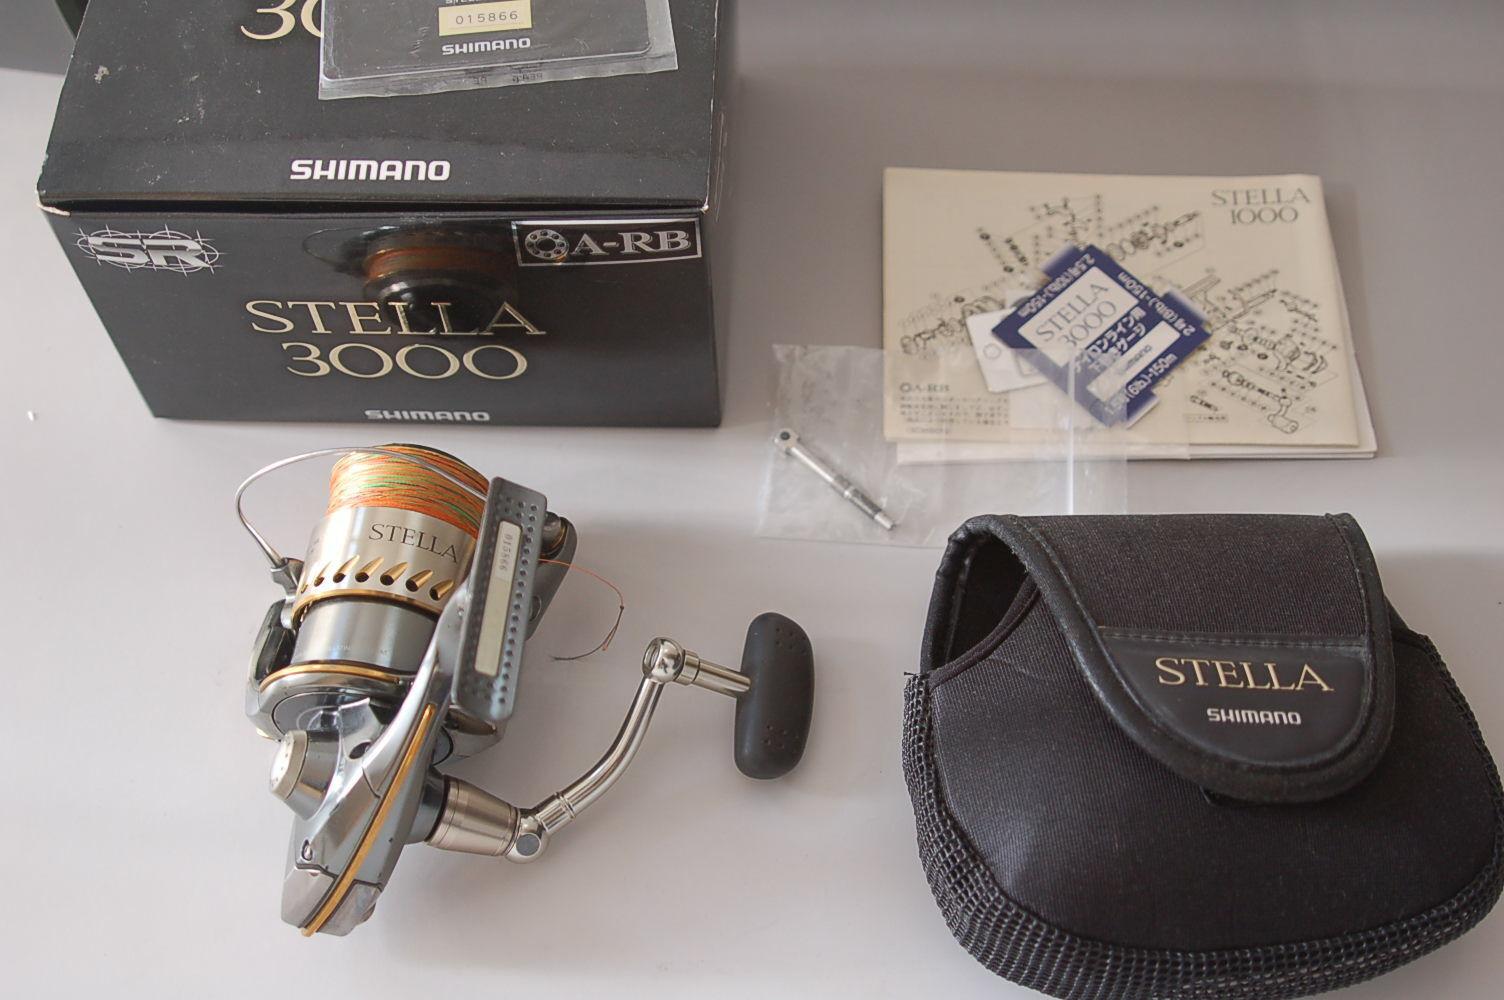 2004 SHIMANO STELLA 3000 In Box Good